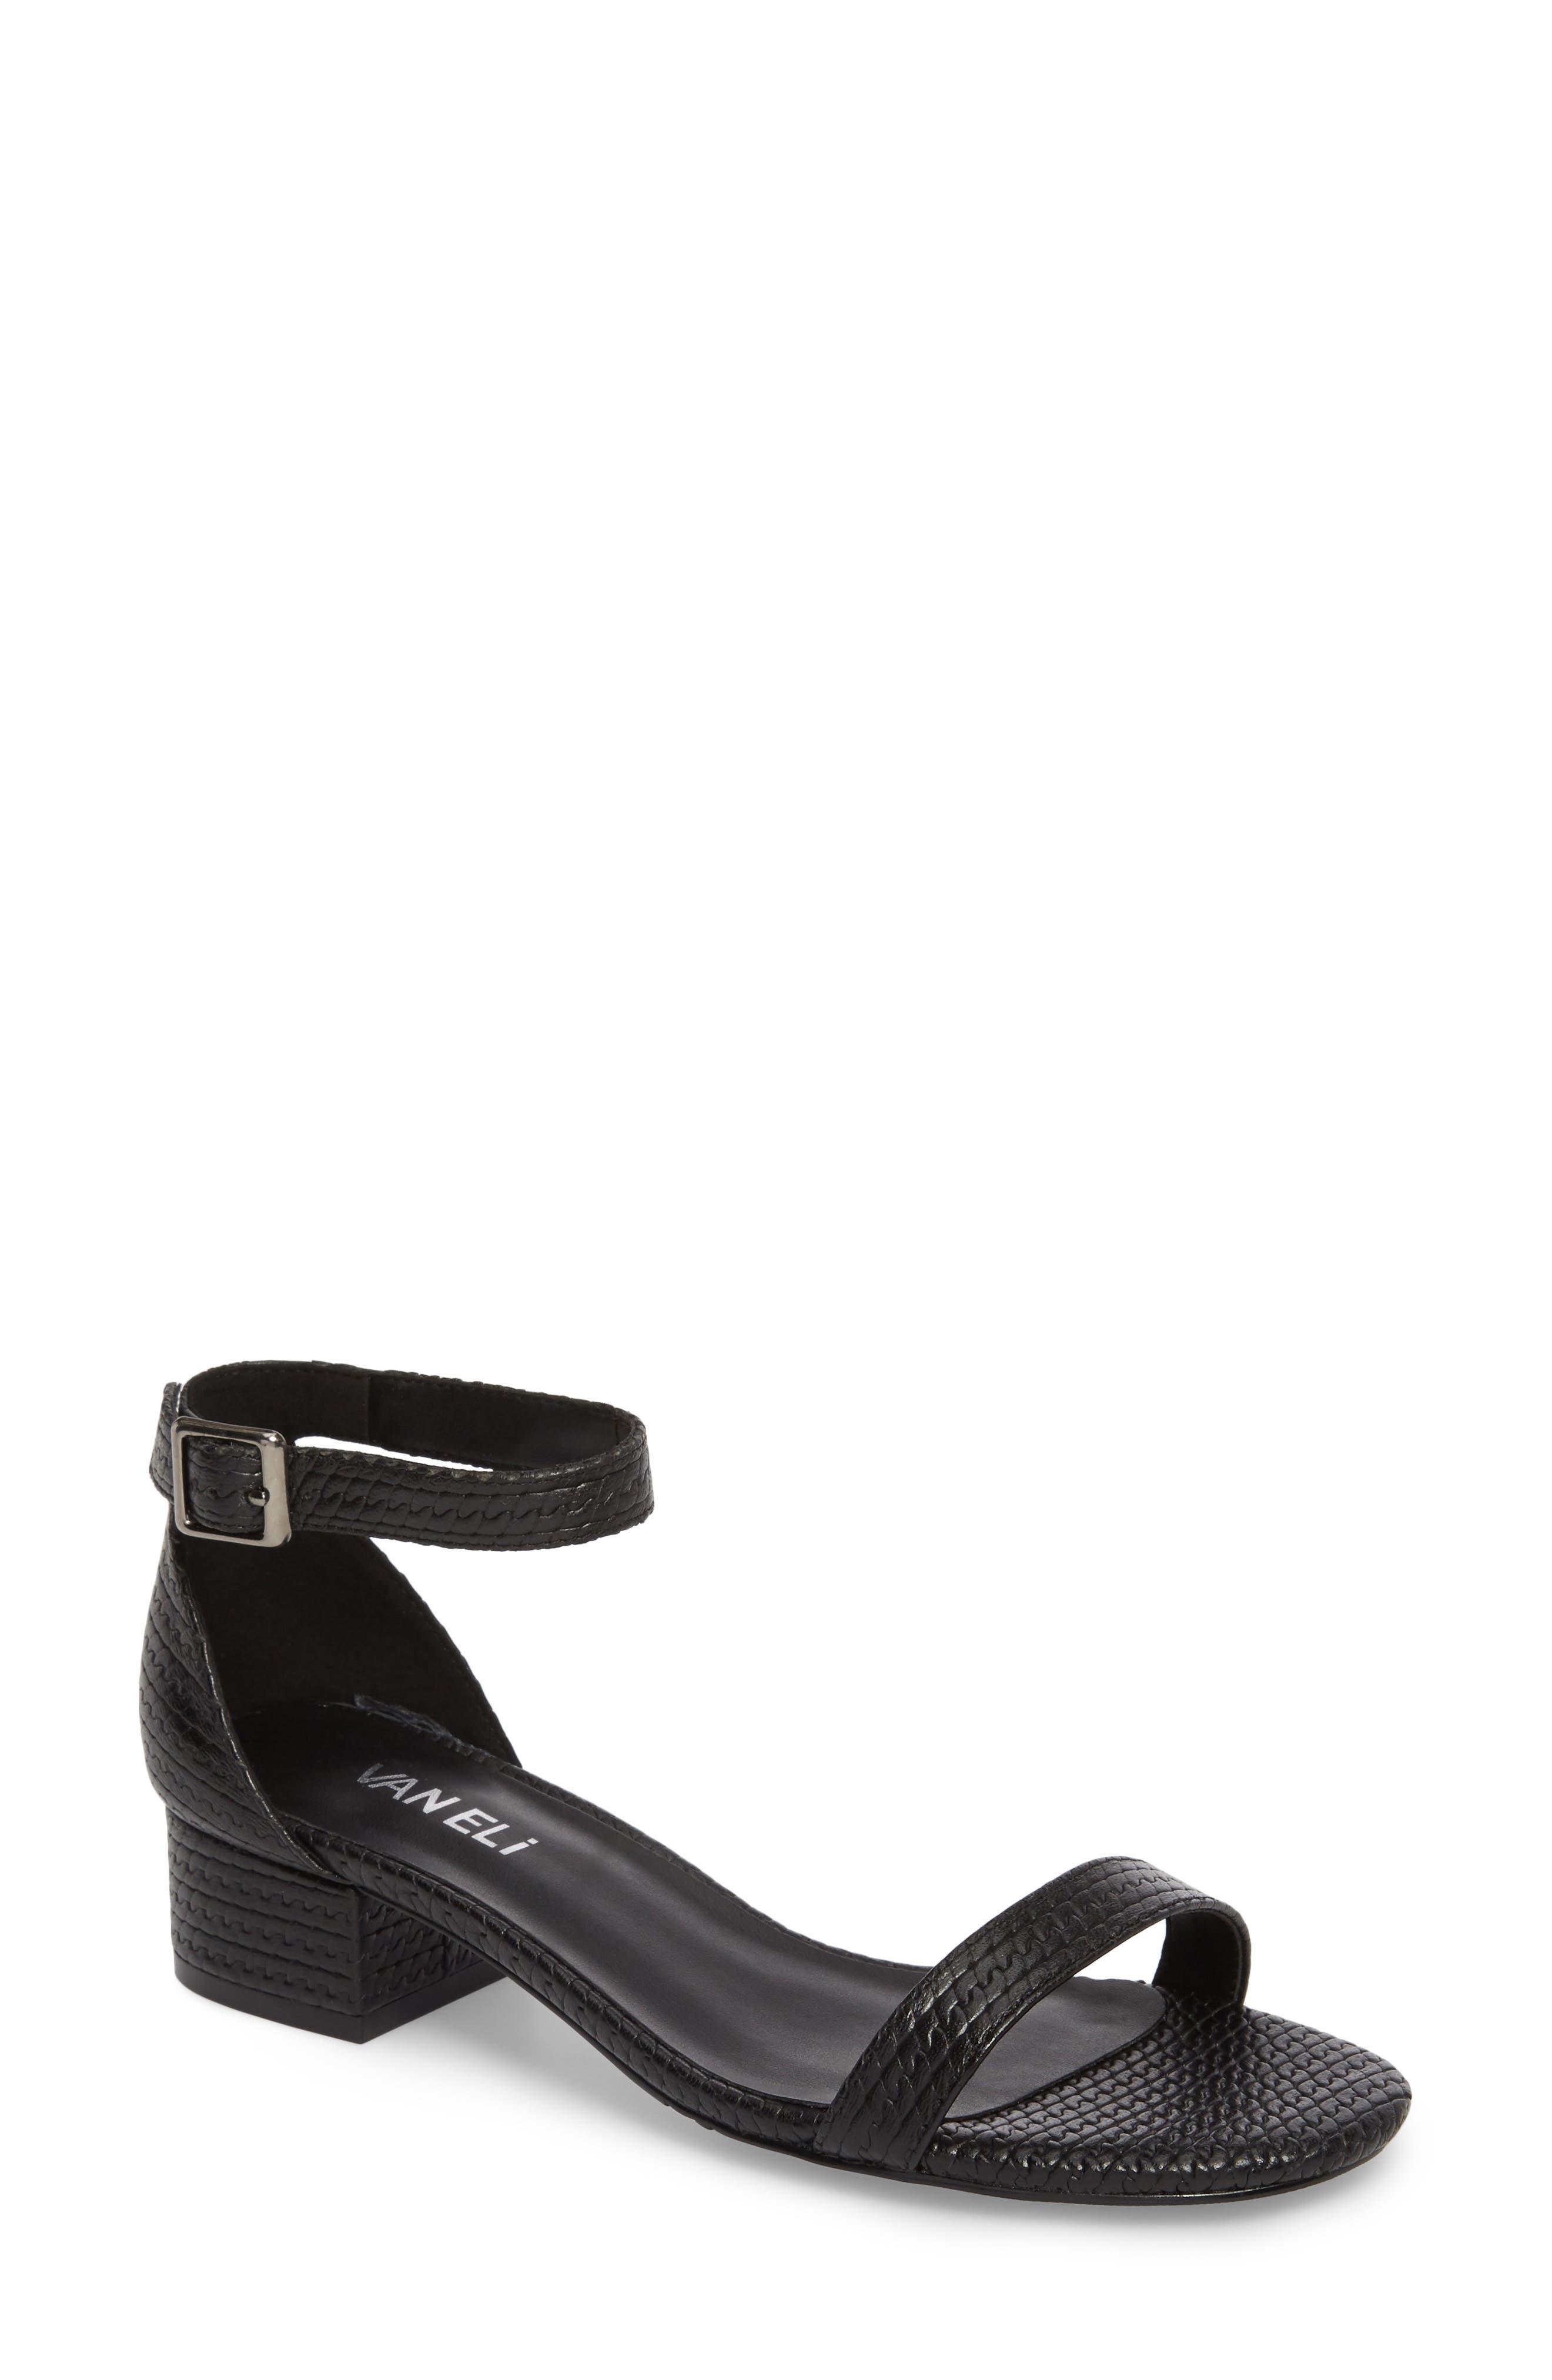 Hirin Sandal,                         Main,                         color, Black Printed Leather